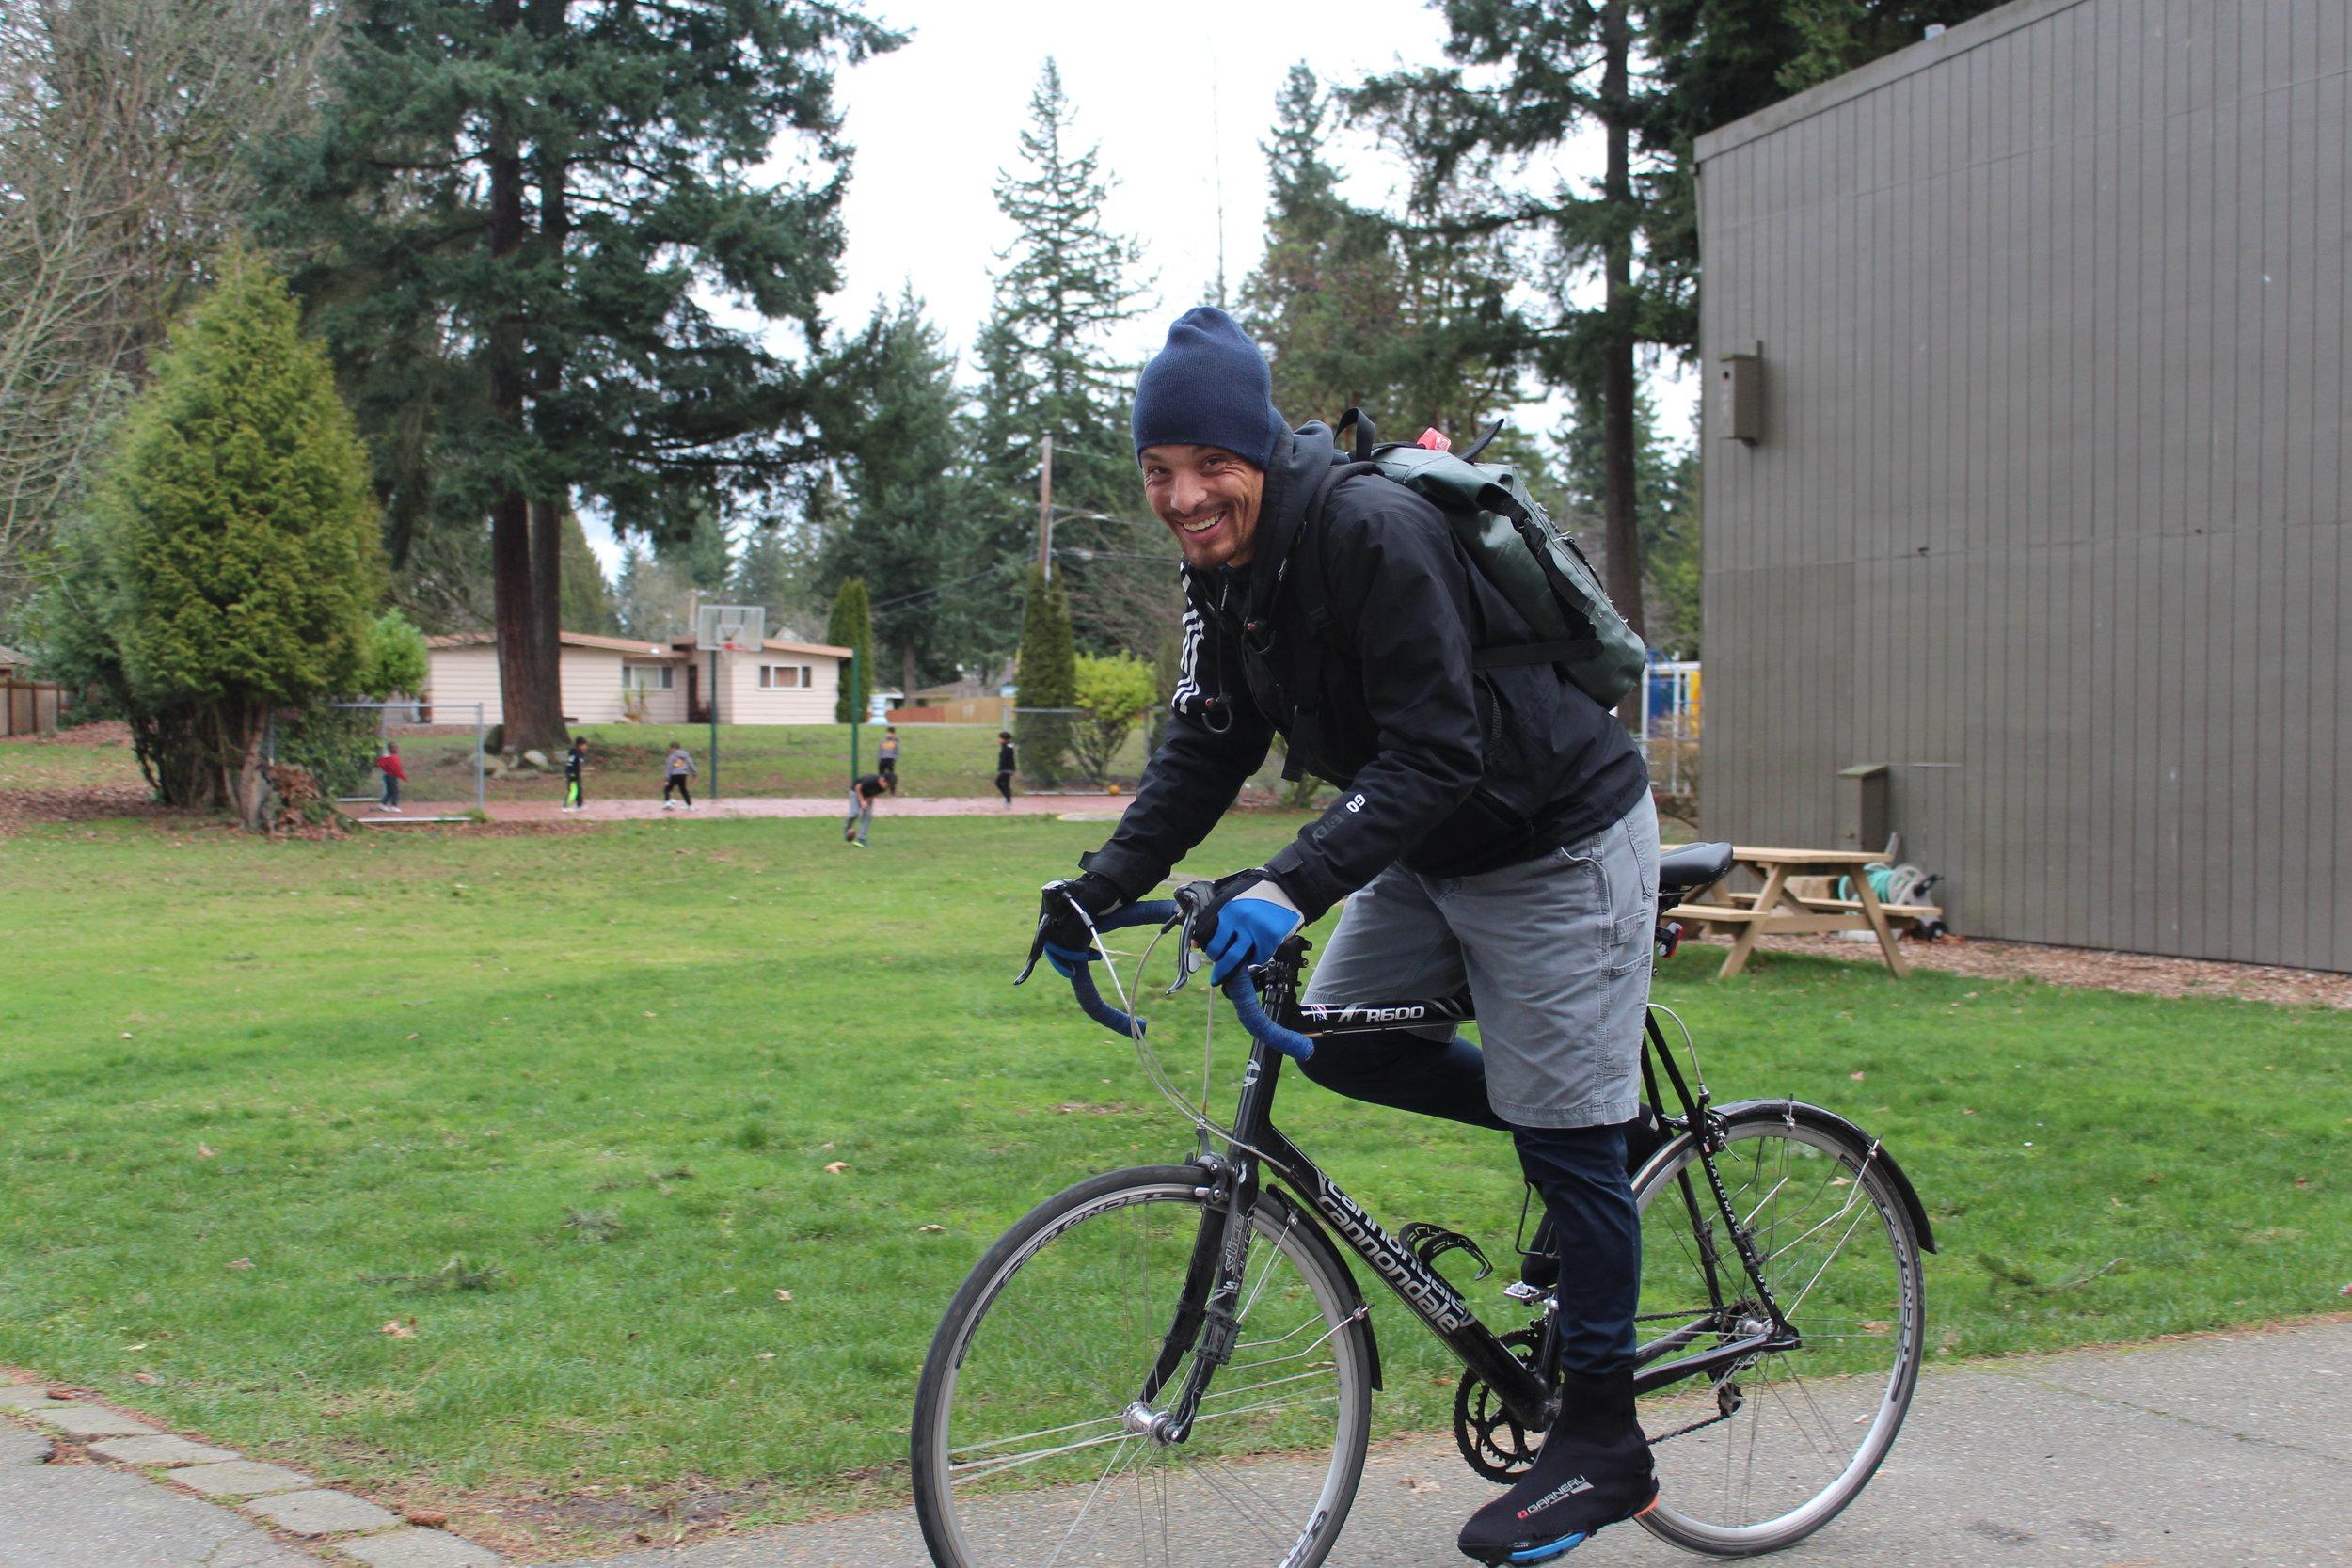 Coach Josh riding on his bike home